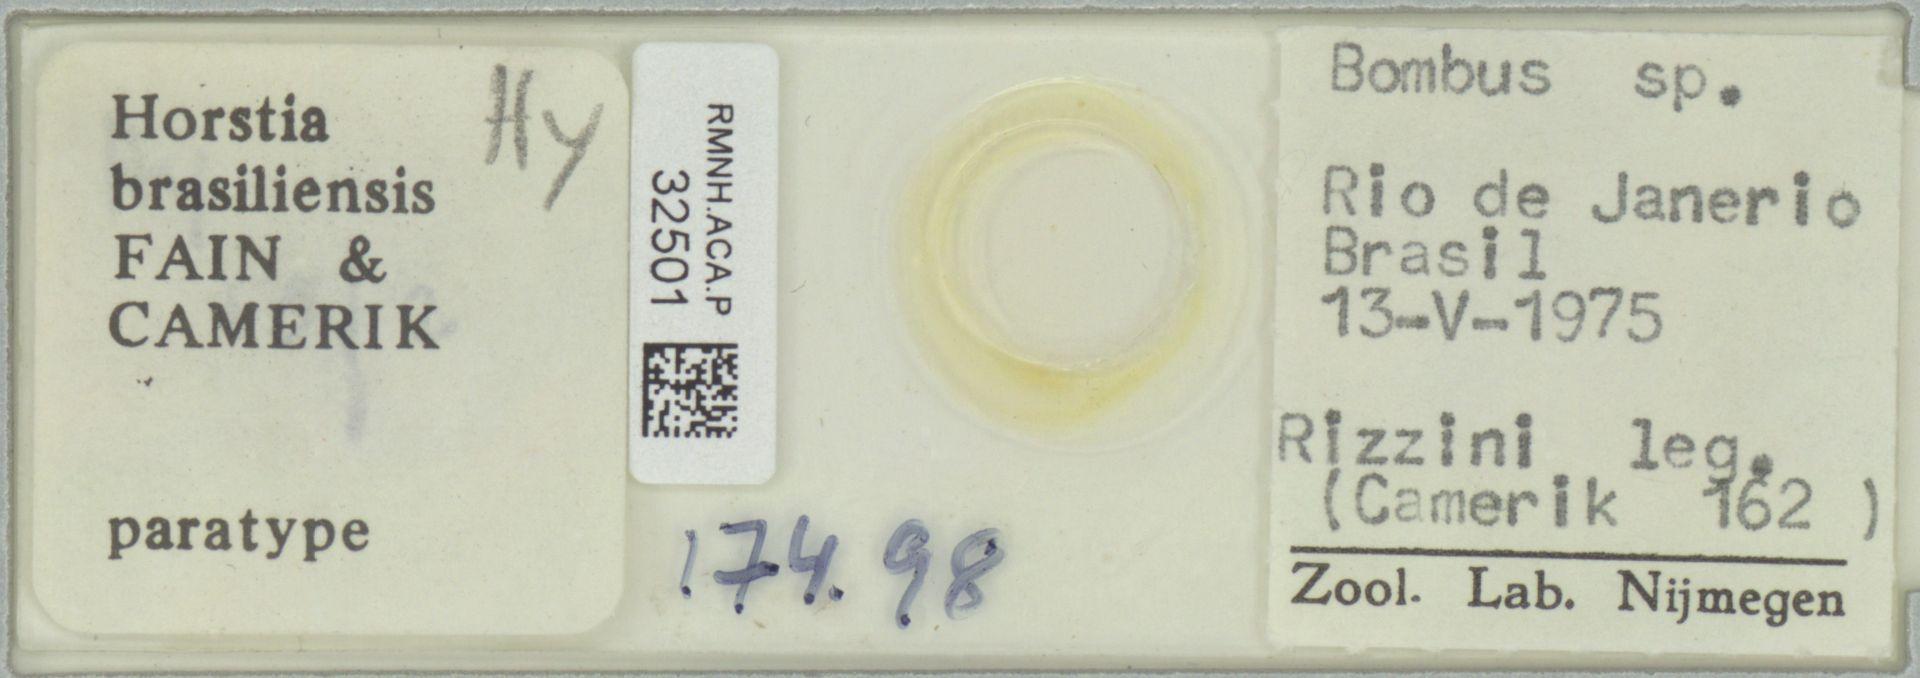 RMNH.ACA.P.32501 | Horstia brasiliensis Fain & Camerik